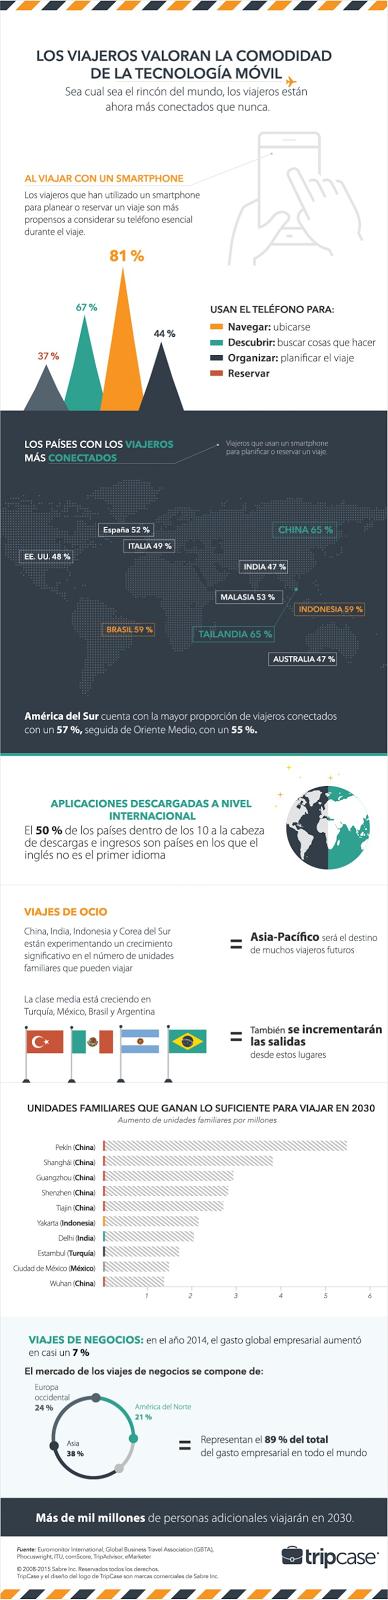 infografia movil y turismo.png